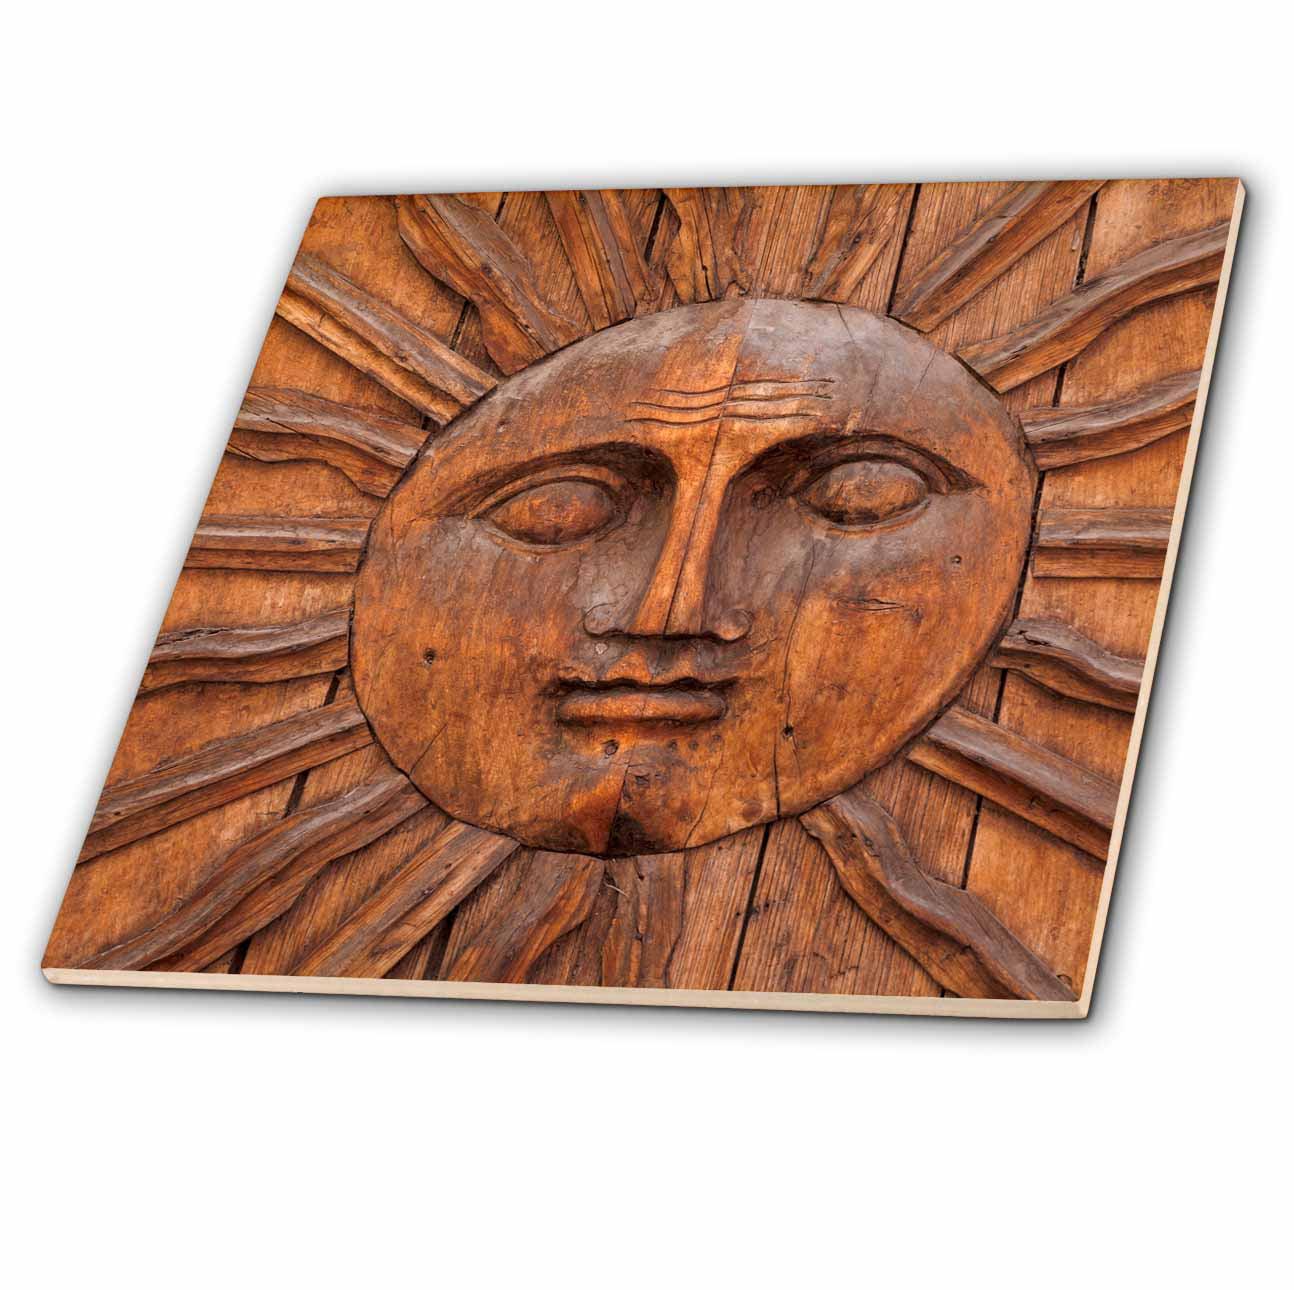 3dRose Mexico, San Miguel de Allende. Image of Sun Carving. - Ceramic Tile, 8-inch